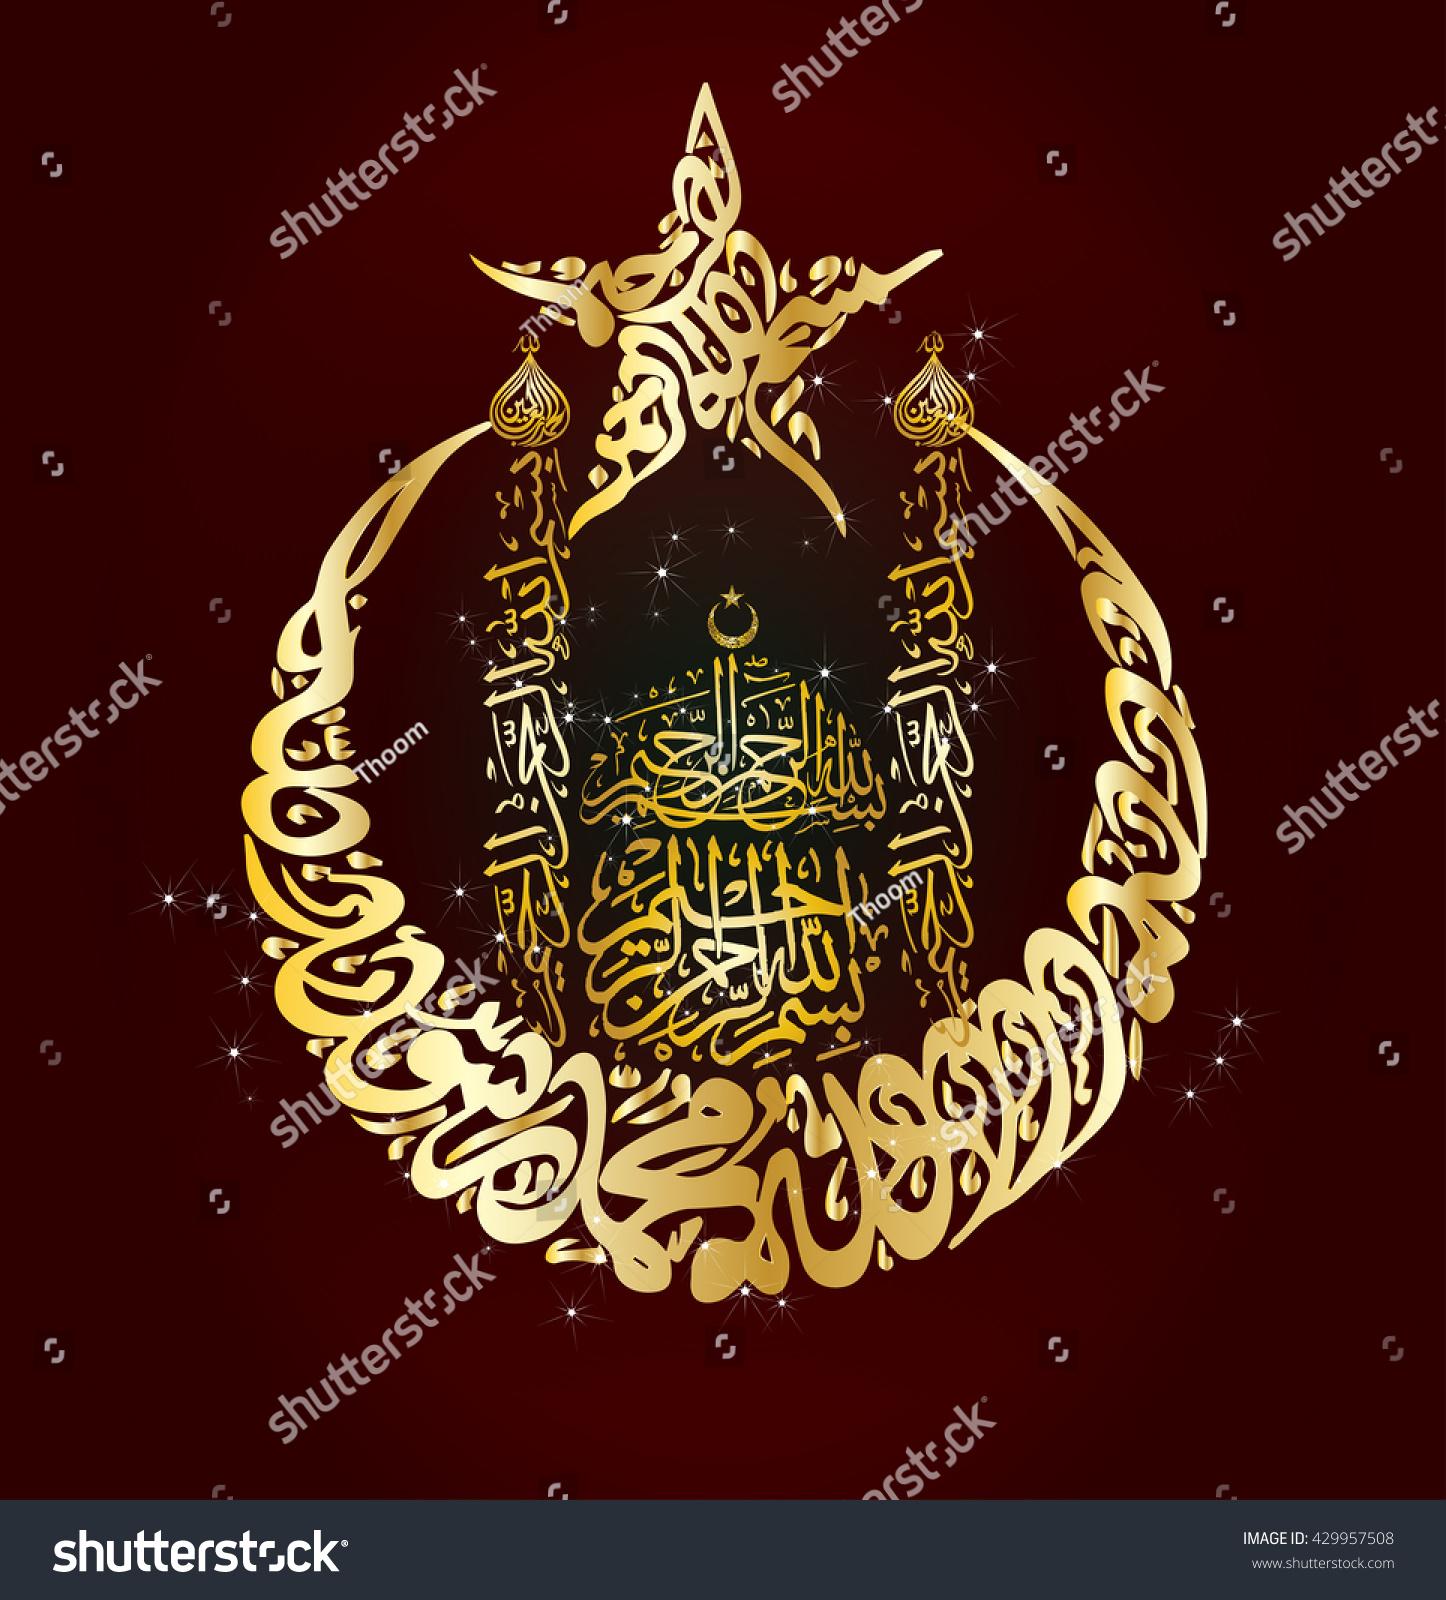 Muslim Islamic Holiday Celebration Greeting Card Stock Vector